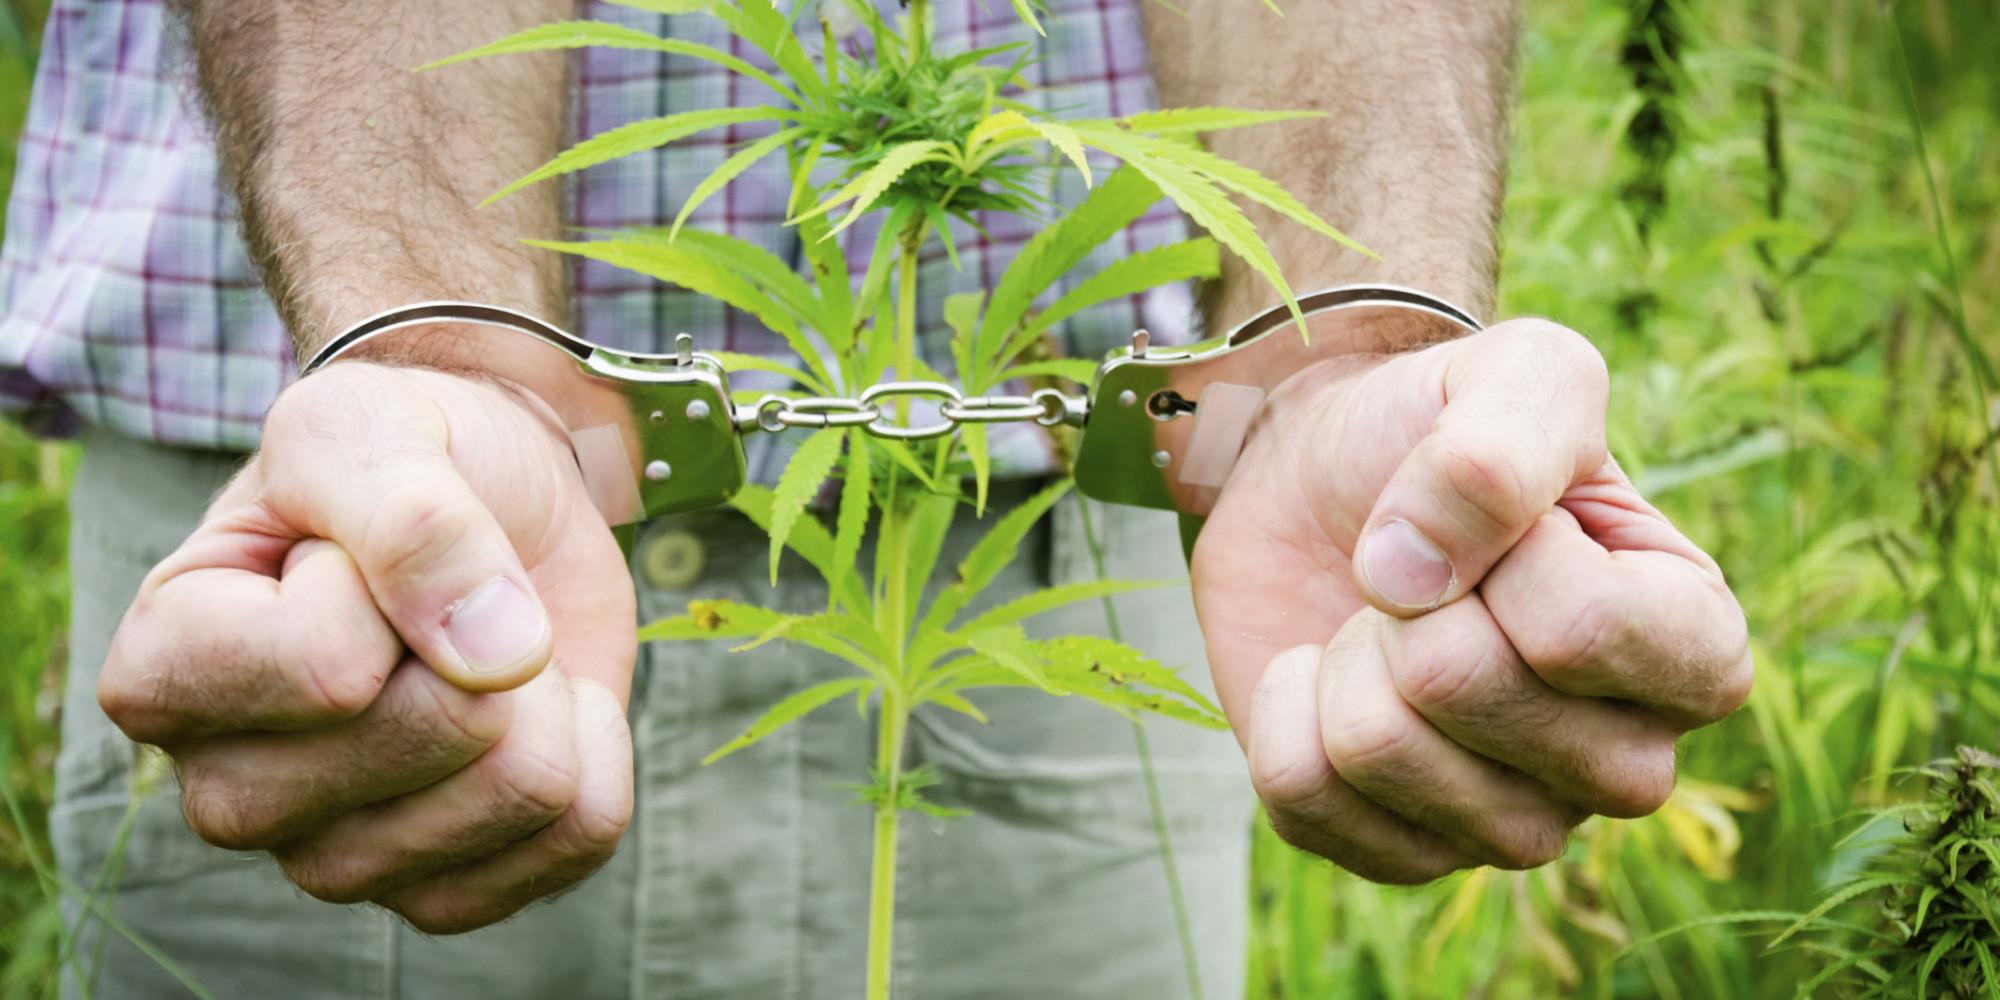 Man in handcuffs - drug crime